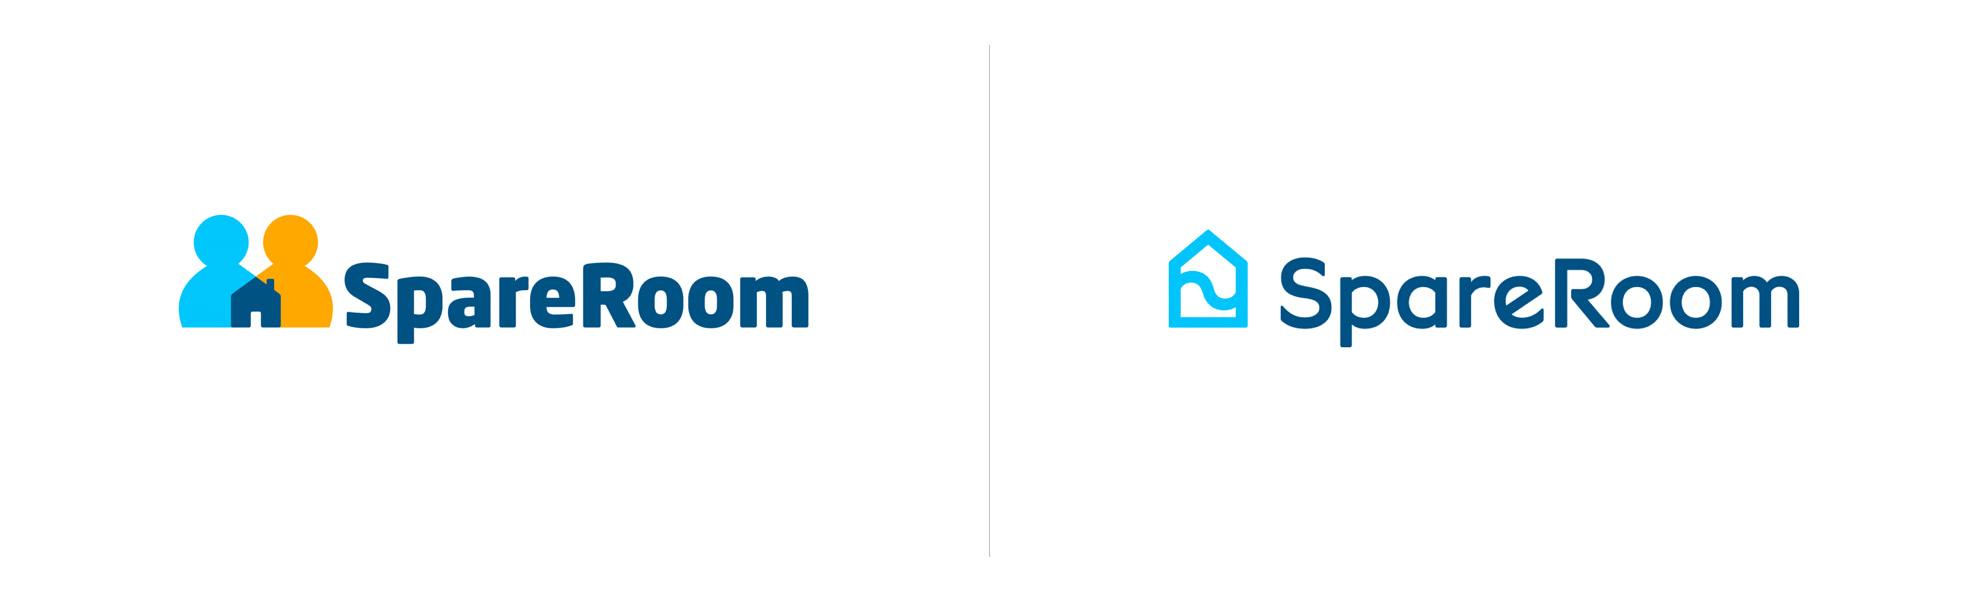 nowe istare logo spareroom